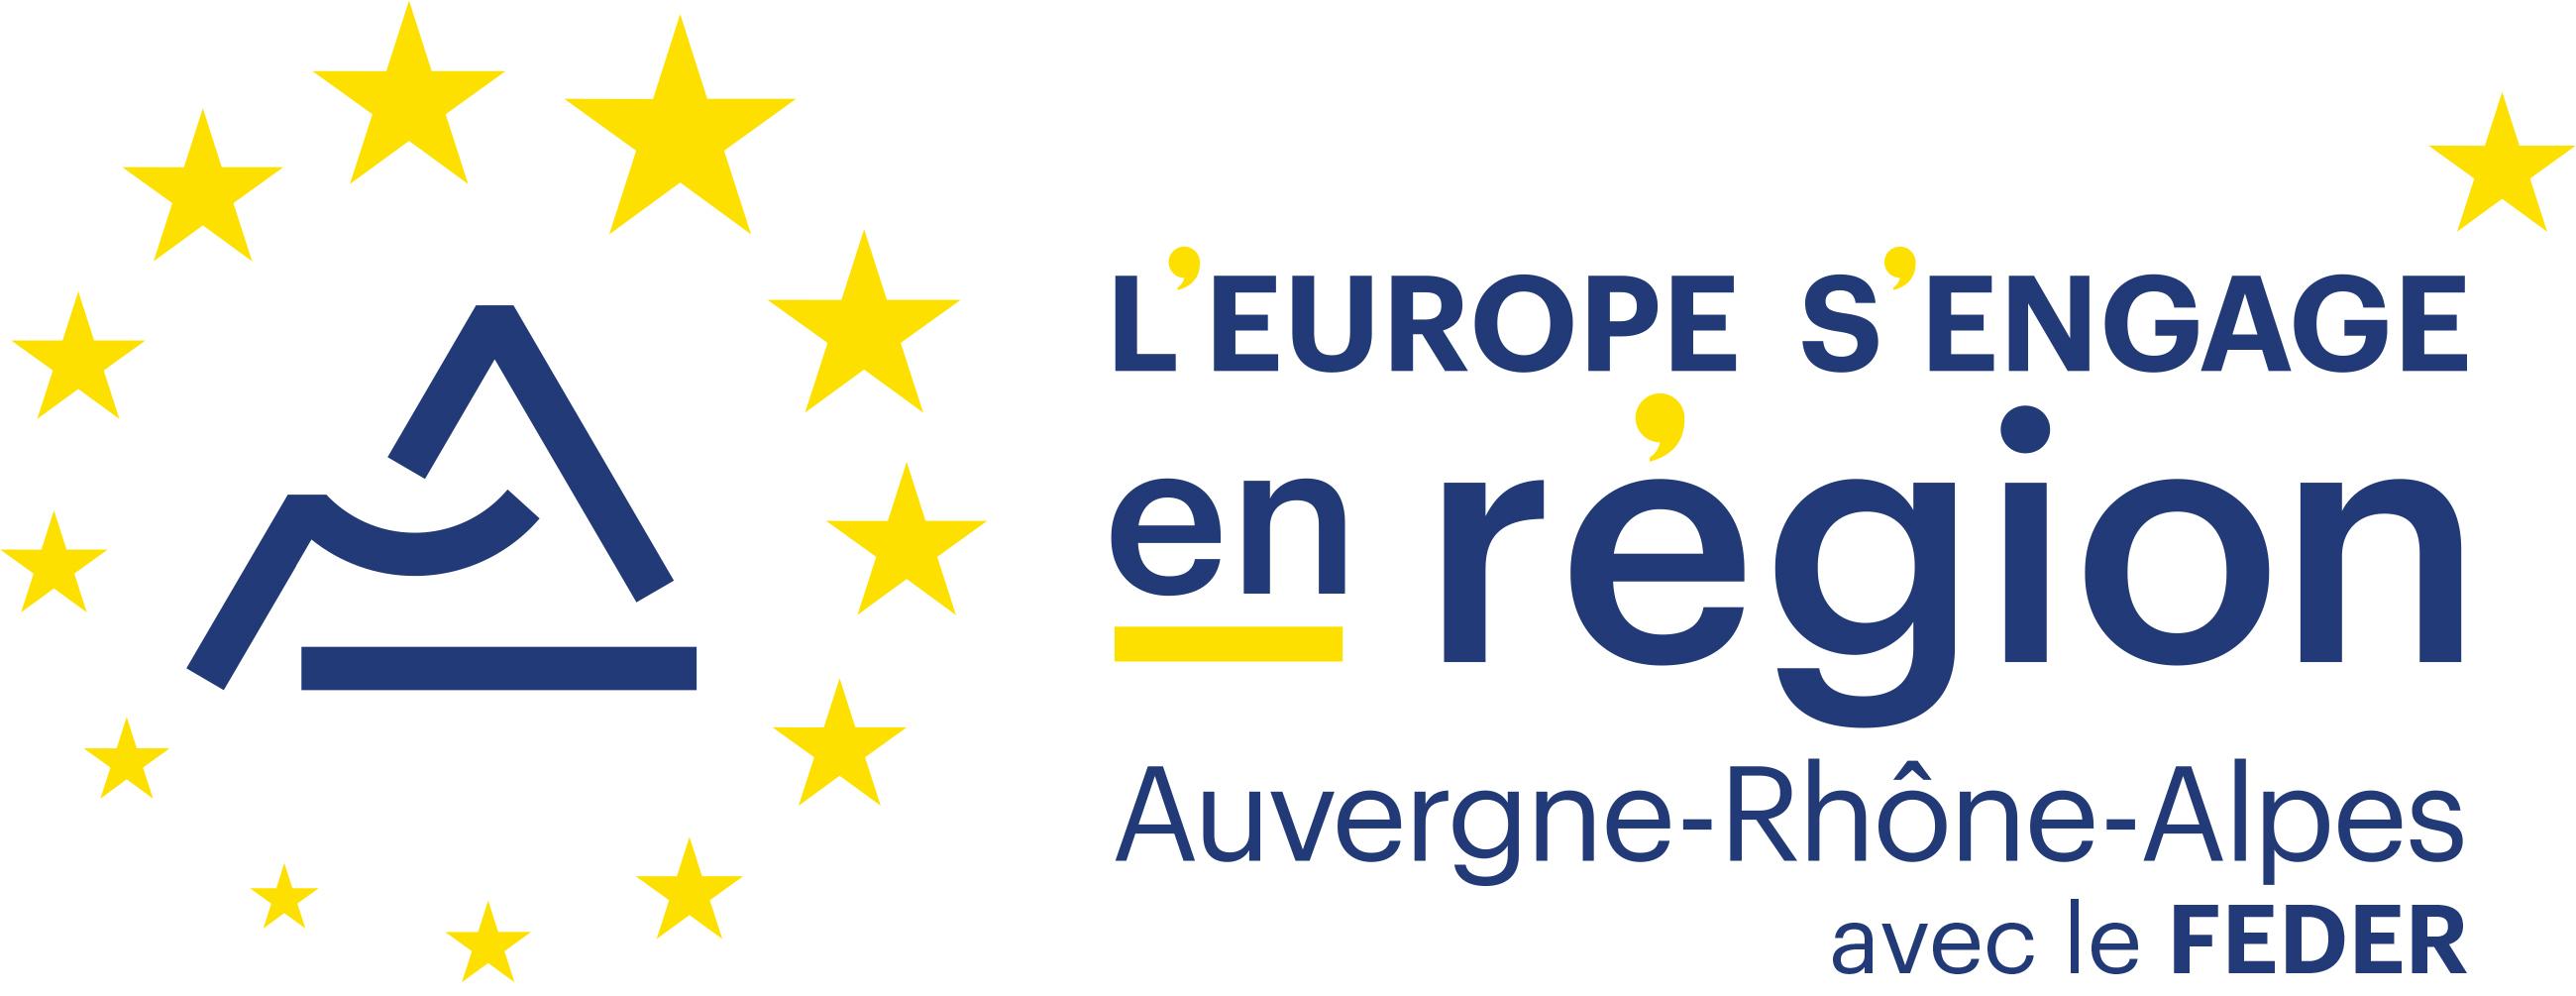 Logo_LEurope_sengage_FEDER_2017_Quadri